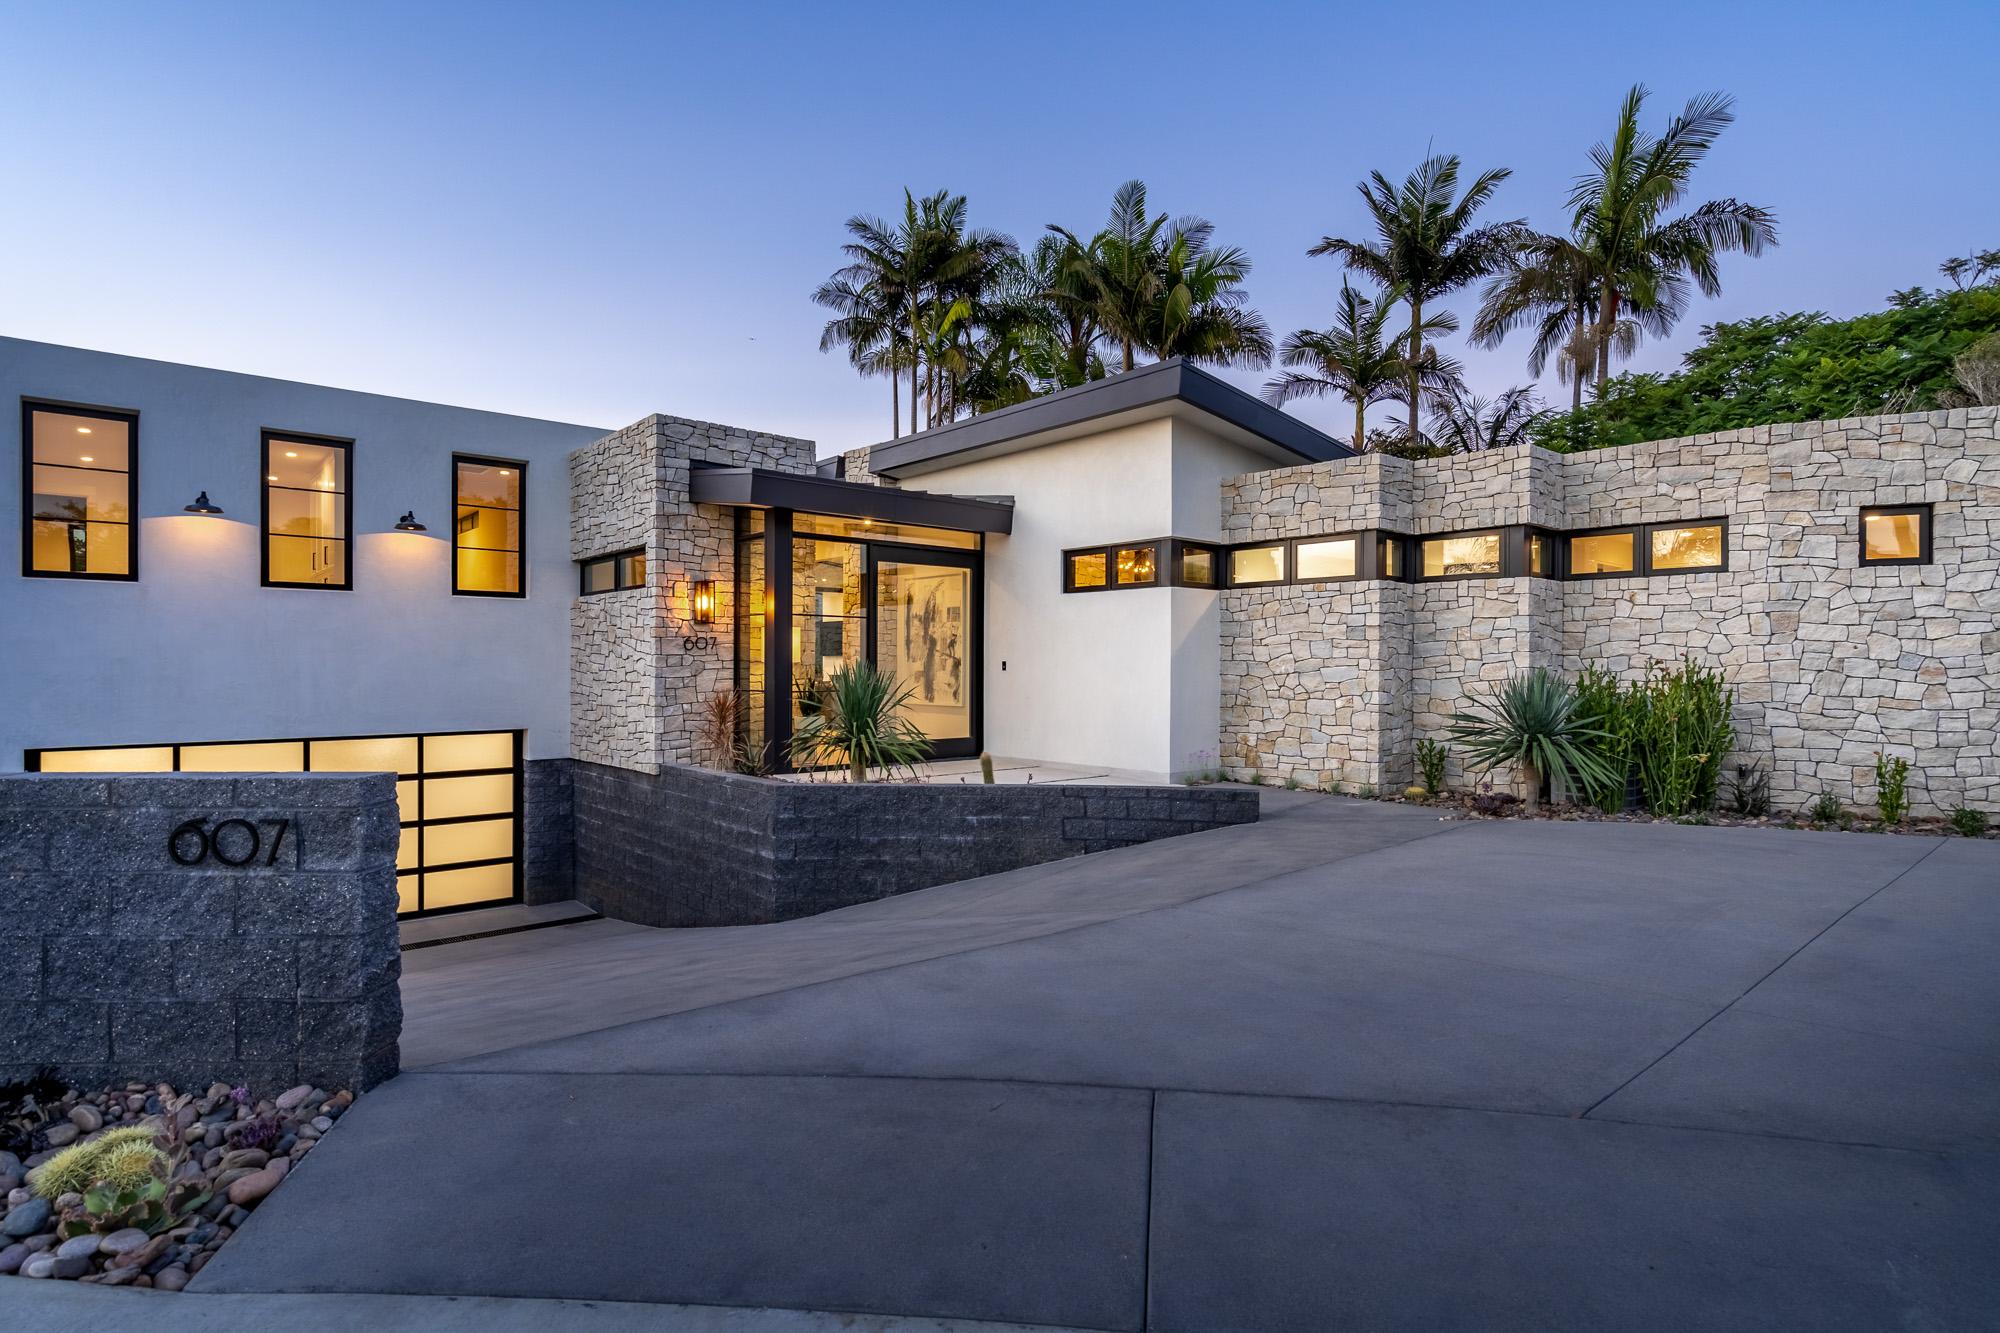 Sold 2020 Laura Represented Seller -  Solana Beach, CA 92075